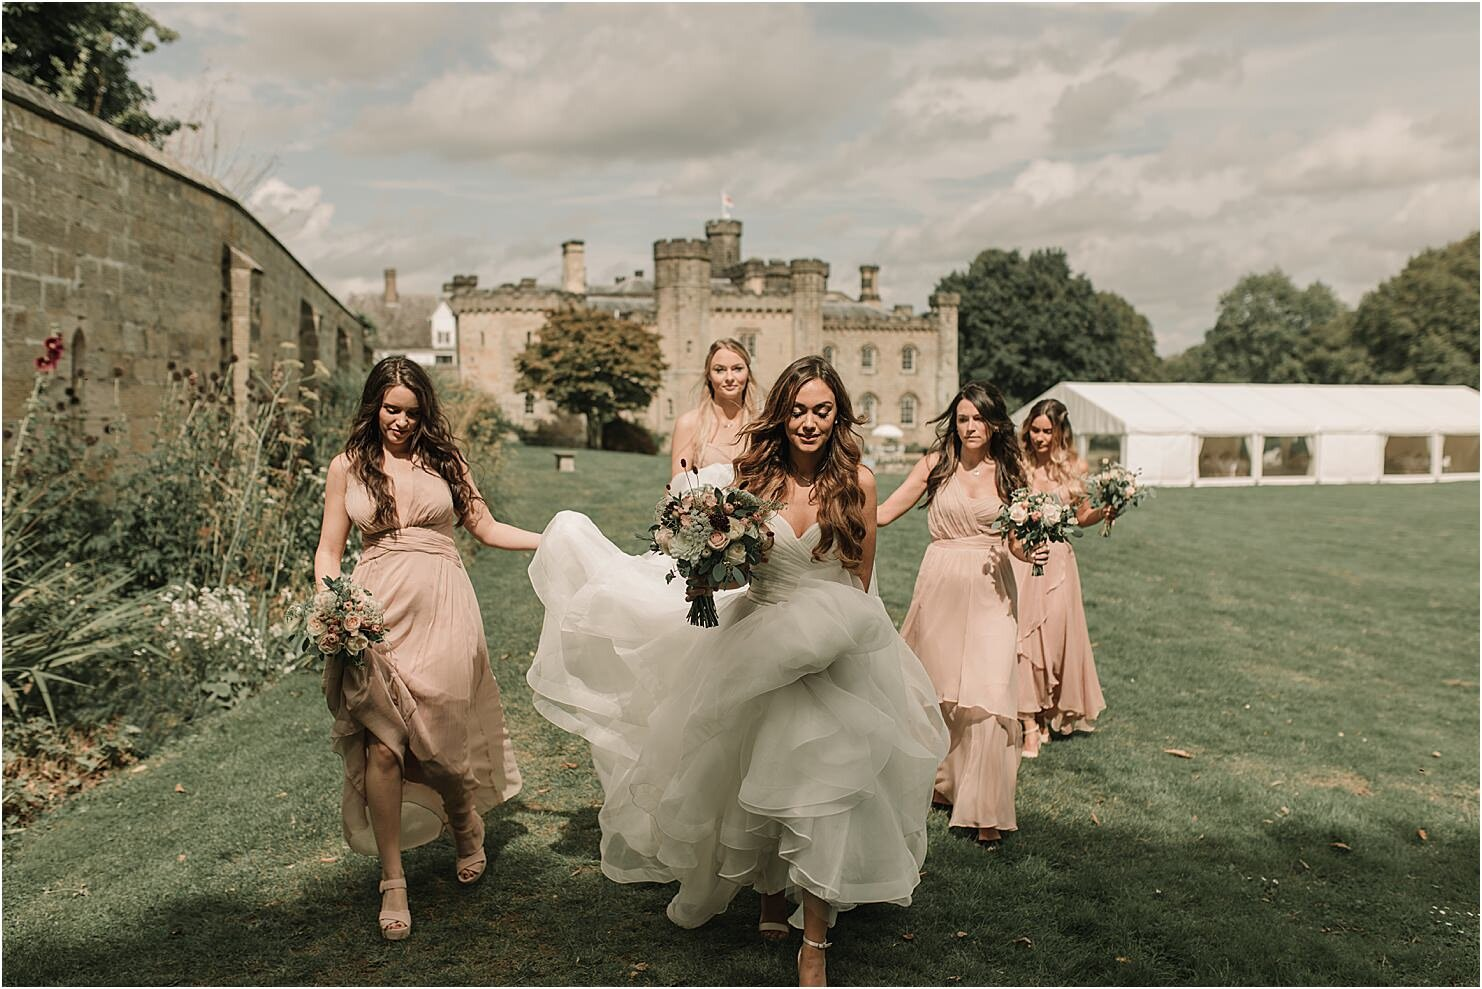 boda-de-cuento-en-castillo-boda-en-londres-44.jpg